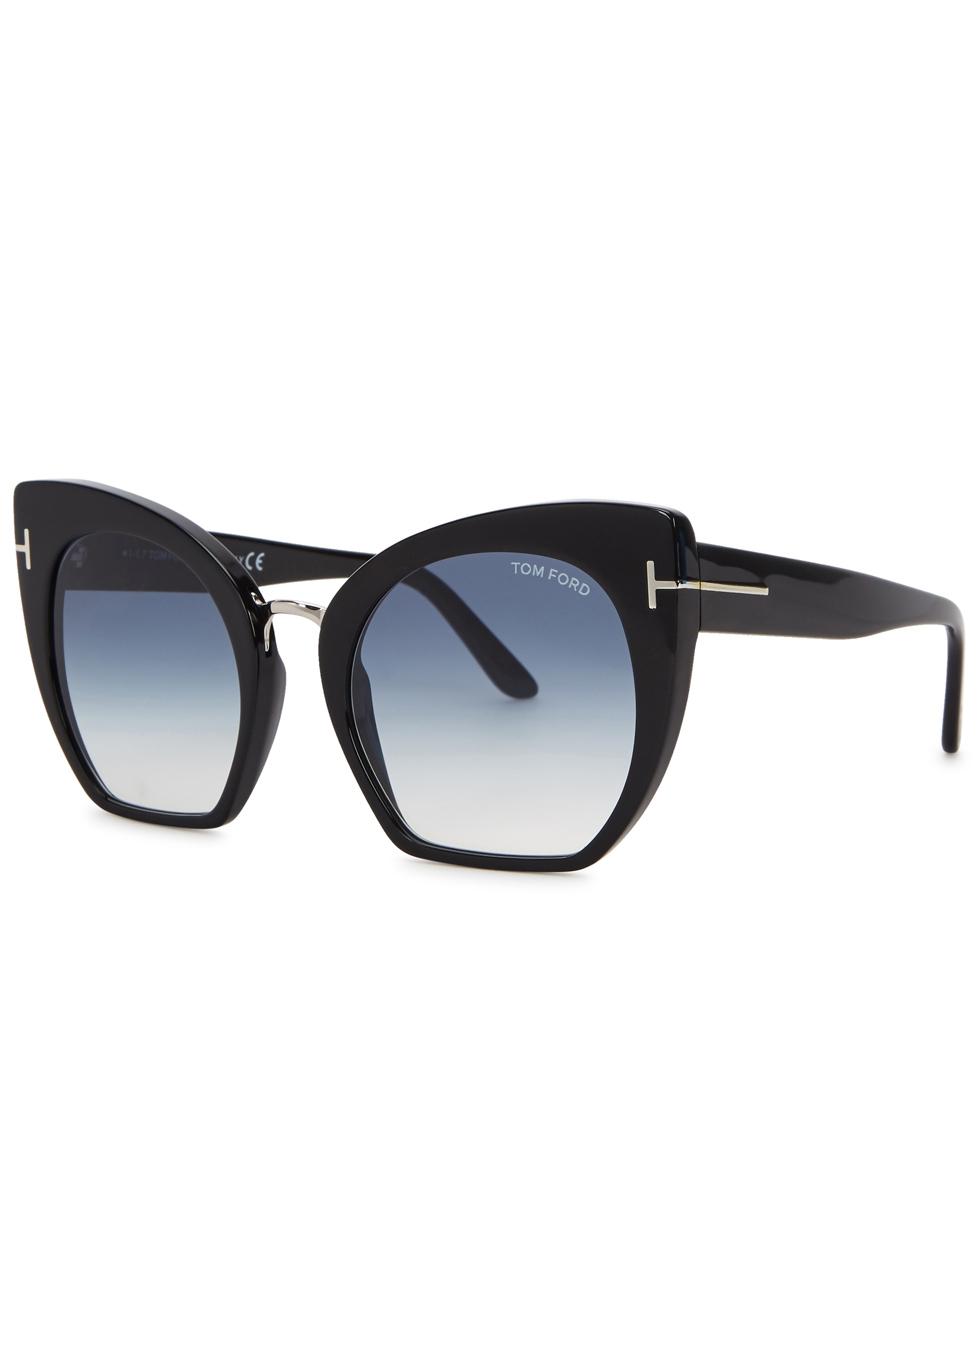 Samantha black cat-eye sunglasses - Tom Ford Eyewear